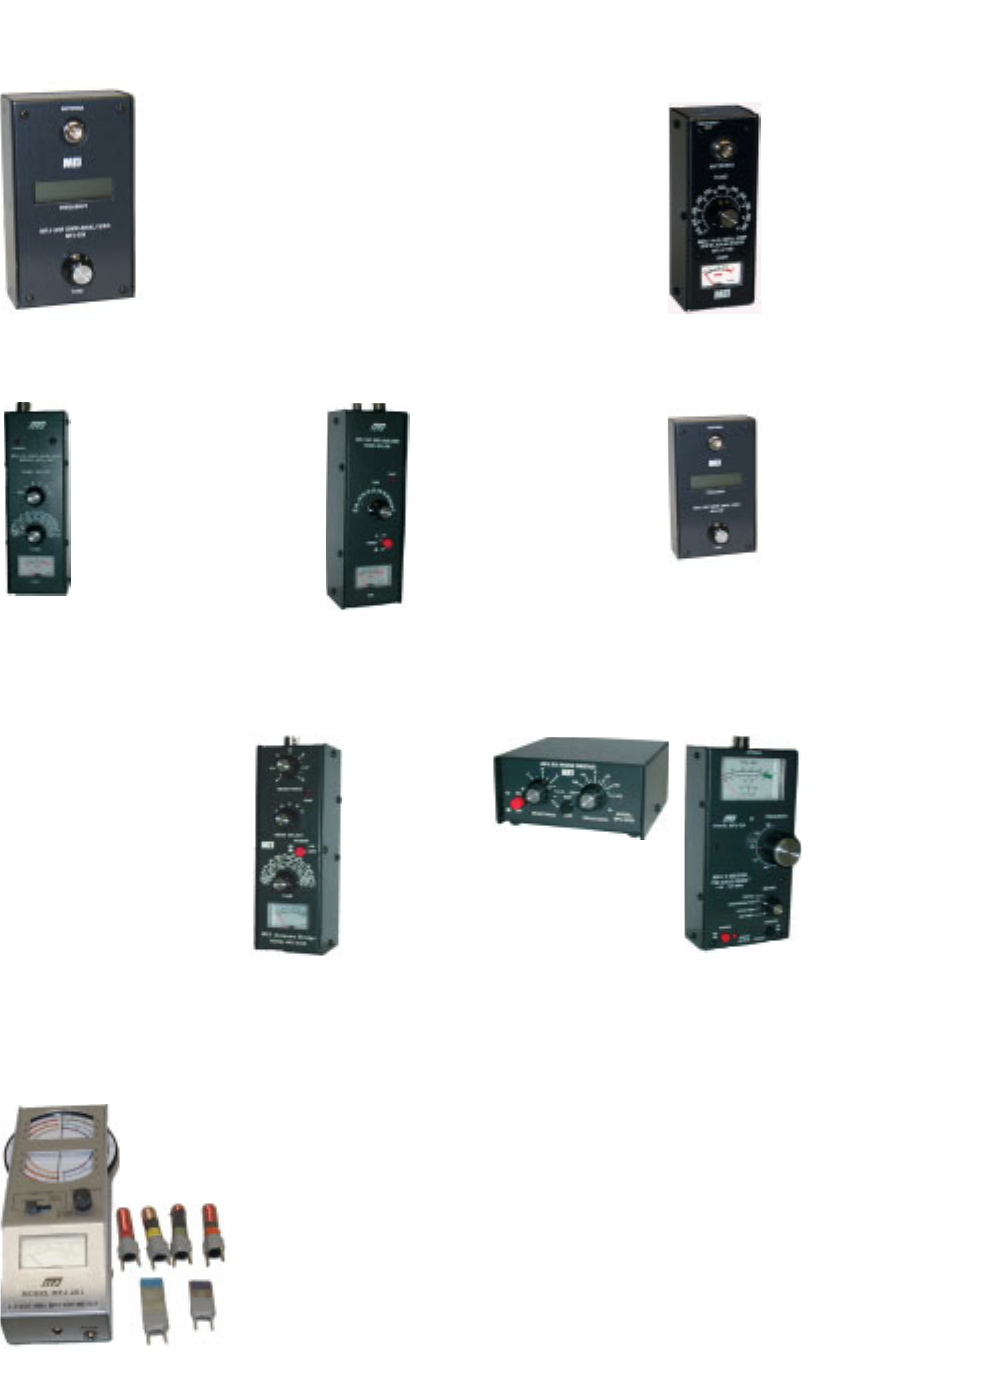 Qstcatp01 Mfj 2004 Broshure 200ma Hour 8211 12v Nicad Battery Charger Mfjenterprisescom 13